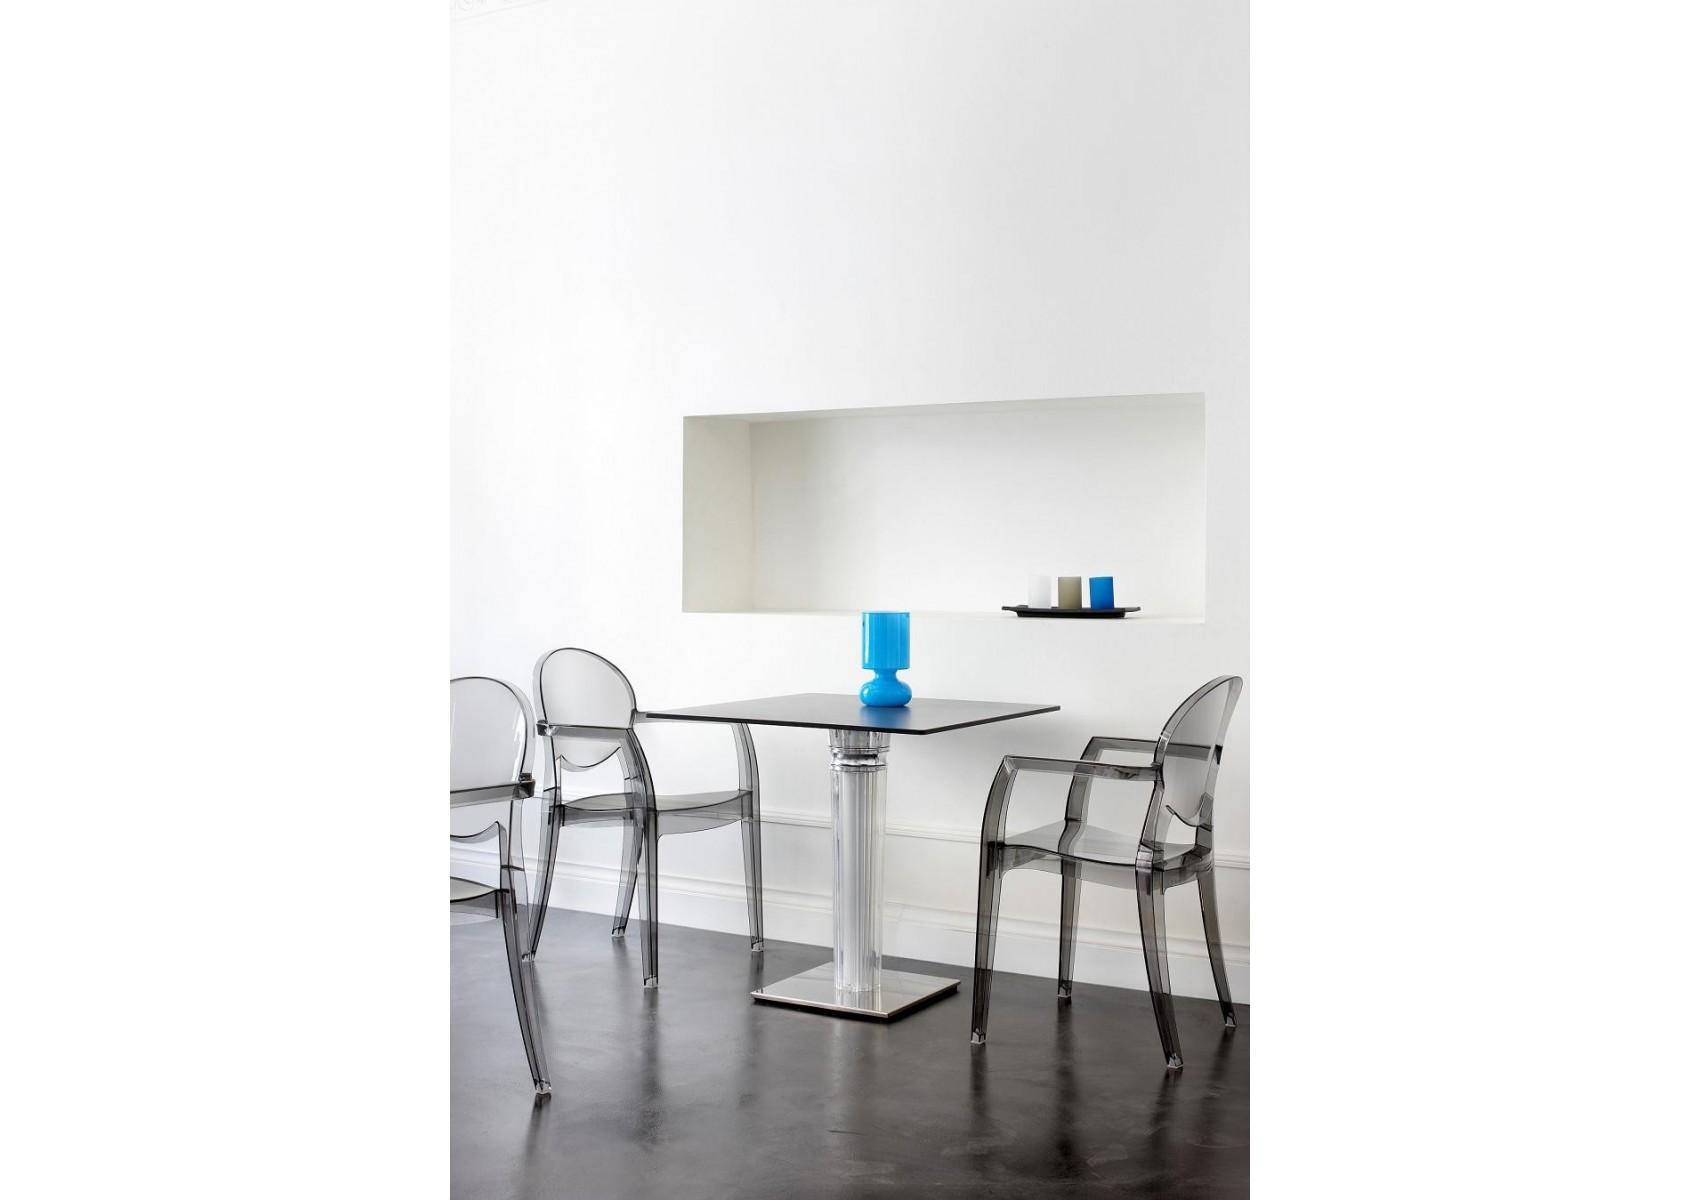 chaise design avec accoudoirs igloo modele d 39 exposition boite design. Black Bedroom Furniture Sets. Home Design Ideas